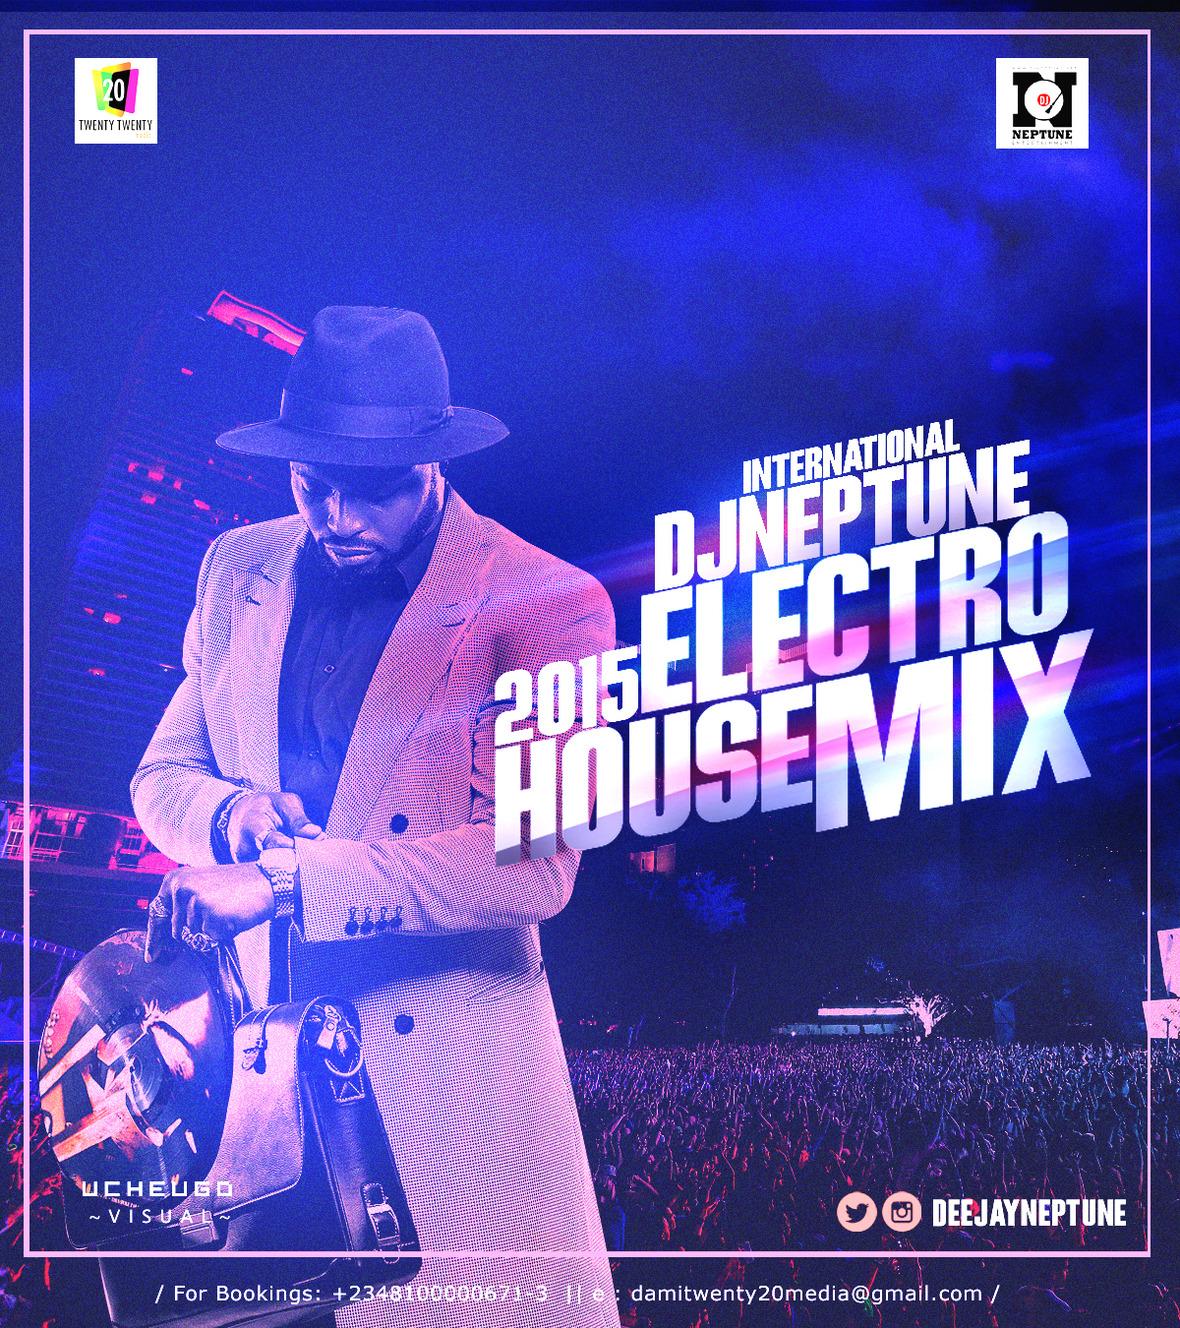 DJ-Neptune-2015-Electro-House-Mix